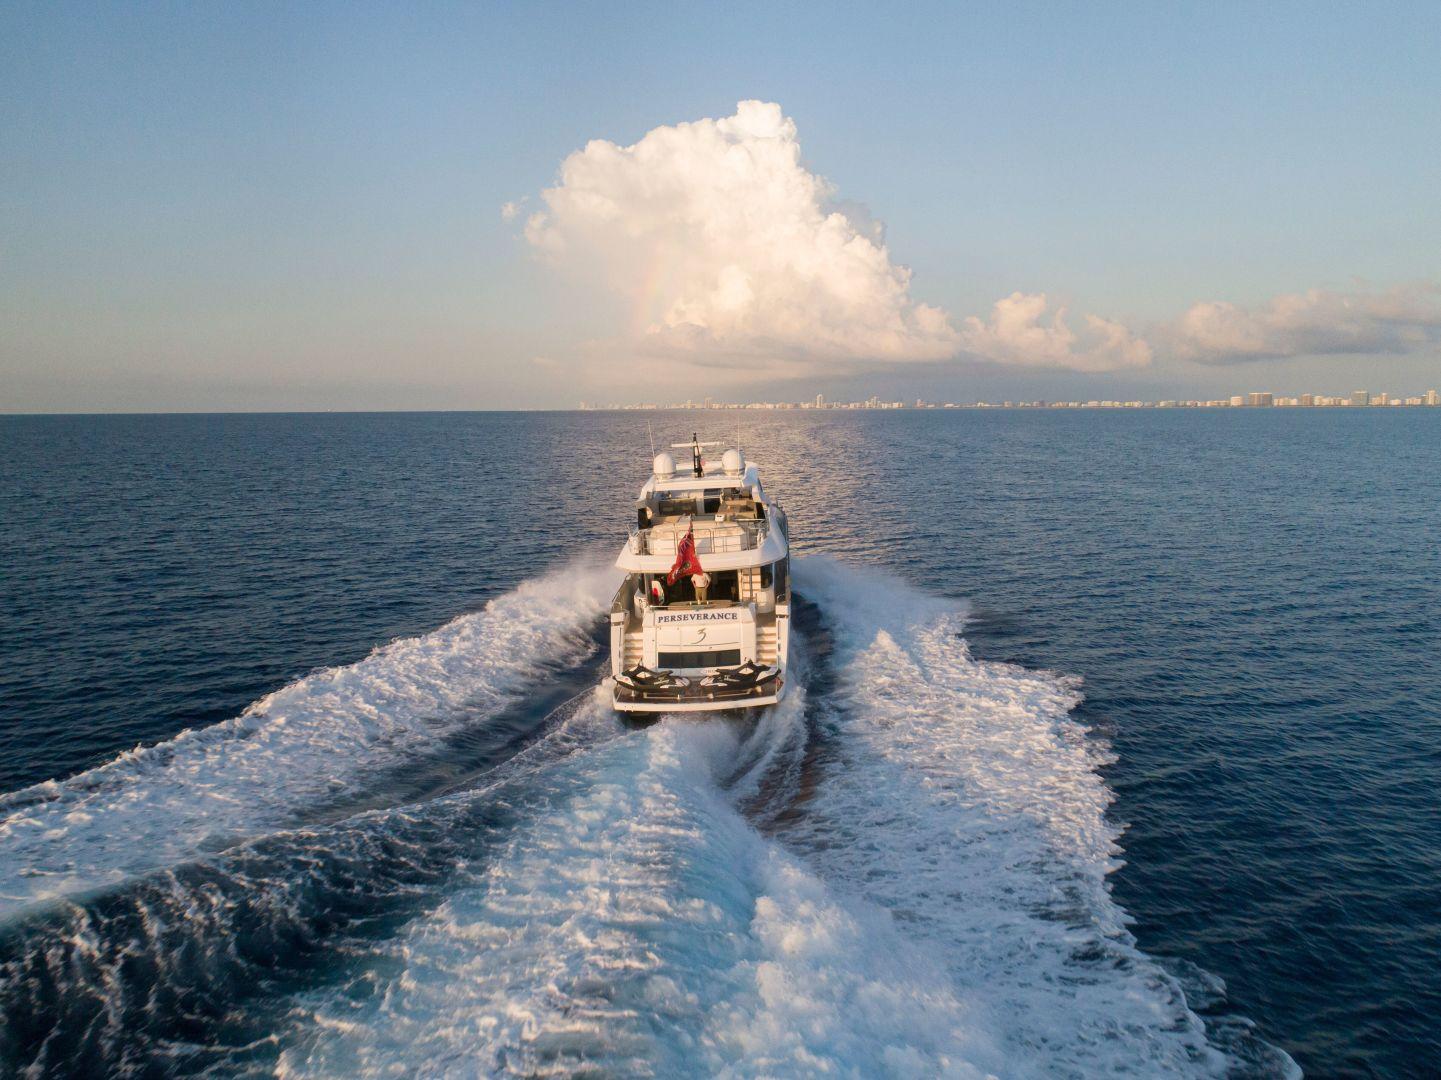 Sunseeker-95 Yacht 2017-Perseverance 3 Ft Lauderdale-Florida-United States-1400067   Thumbnail